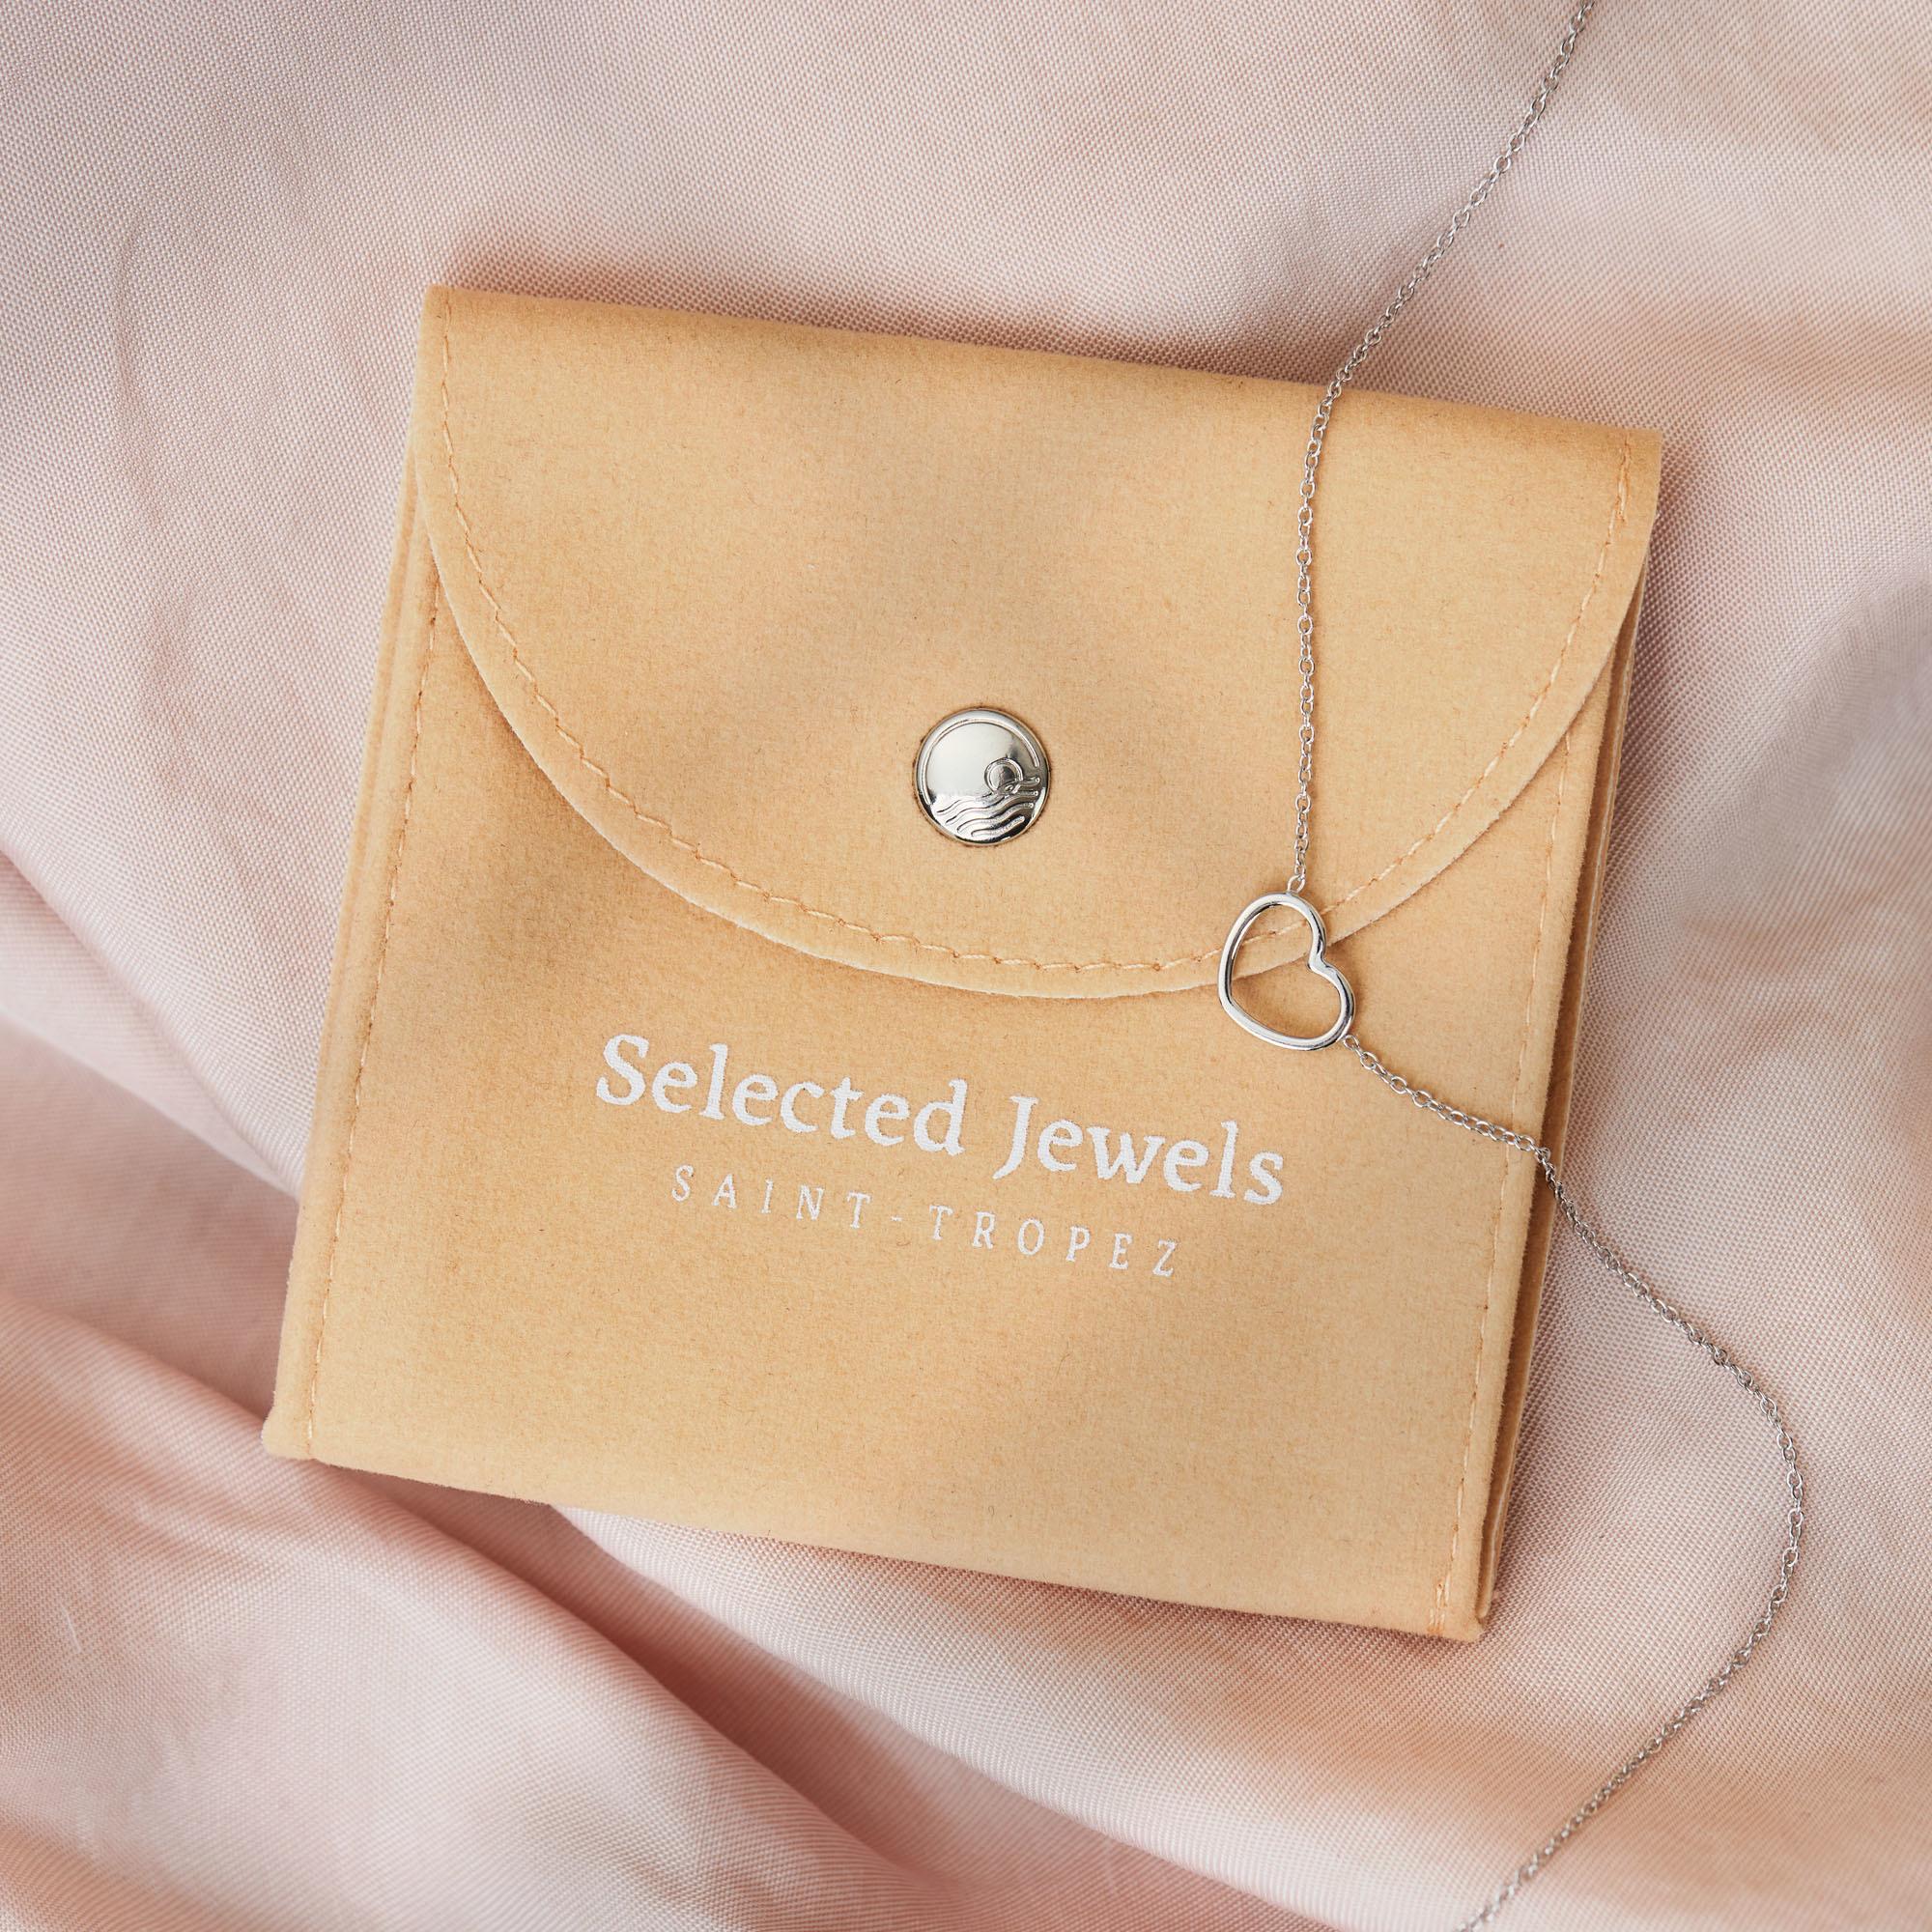 Selected Jewels Selected Gifts ensemble bracelet et collier en argent sterling 925